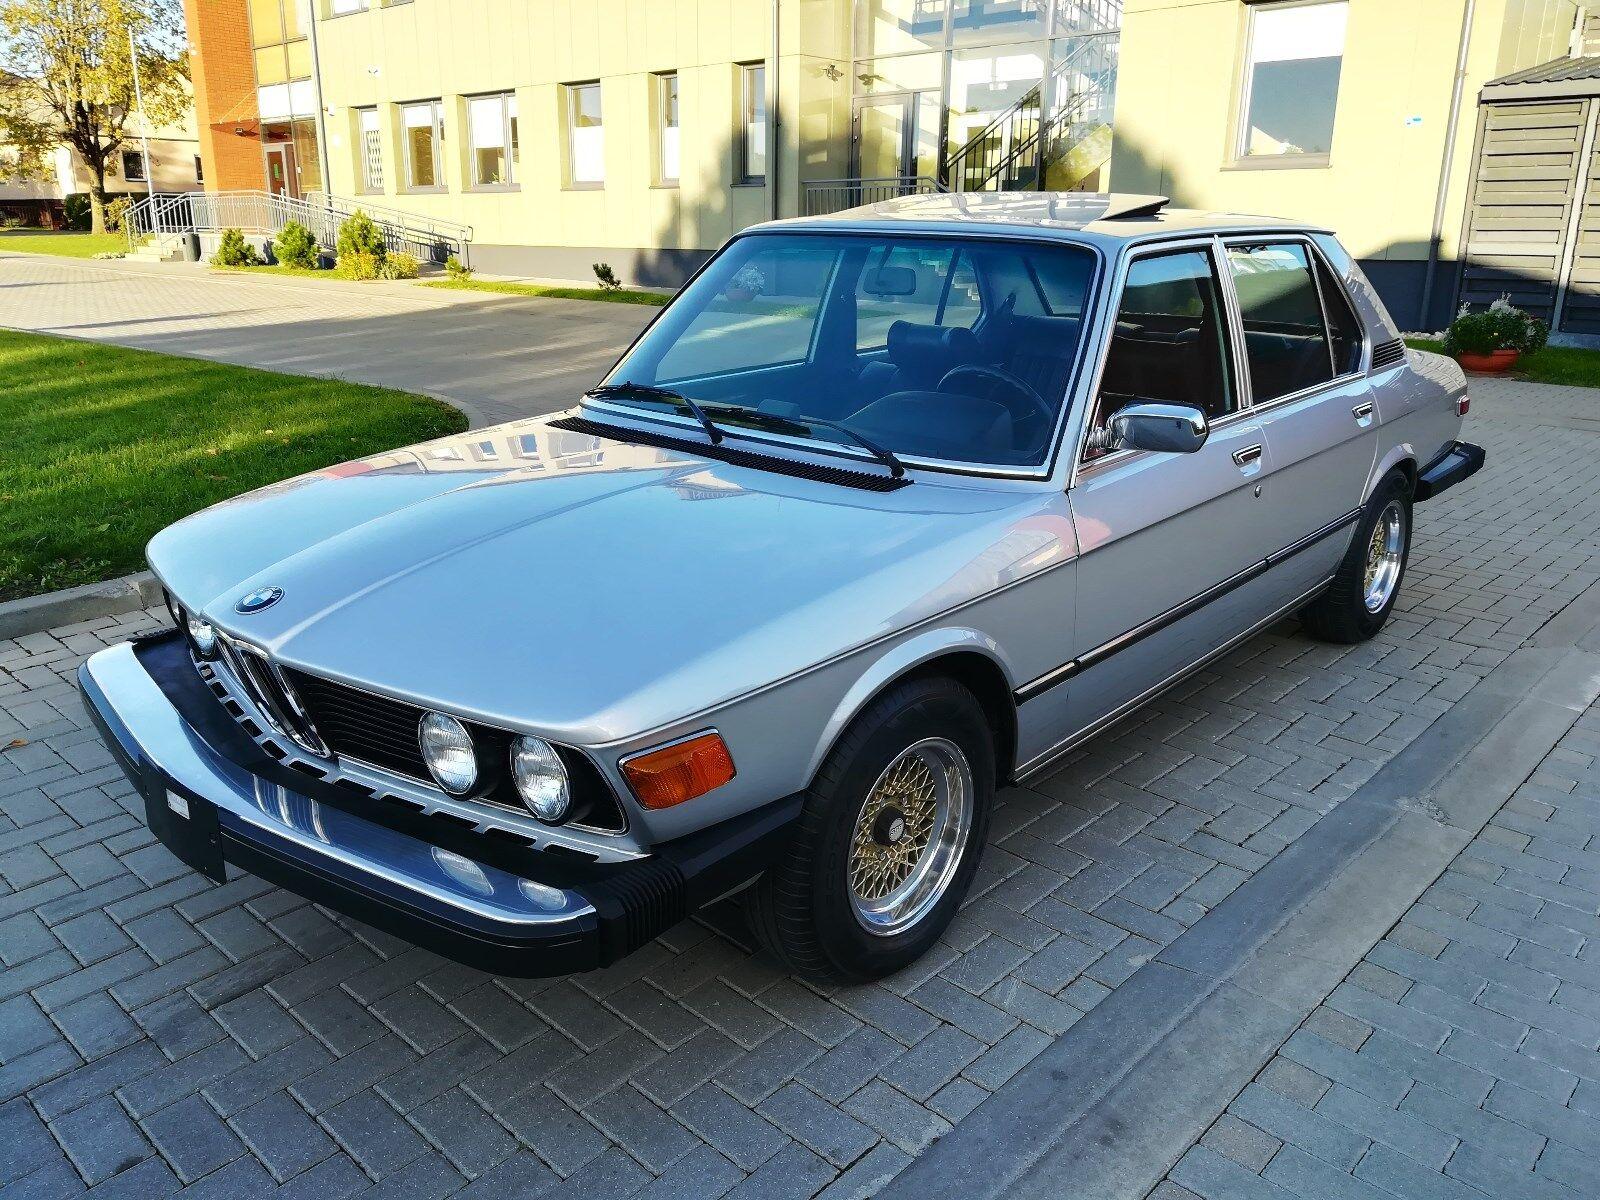 BMW 530i E12 Bj.1978 Oldtimer, Absolut Rostfrei, Vollaustattung, BBS